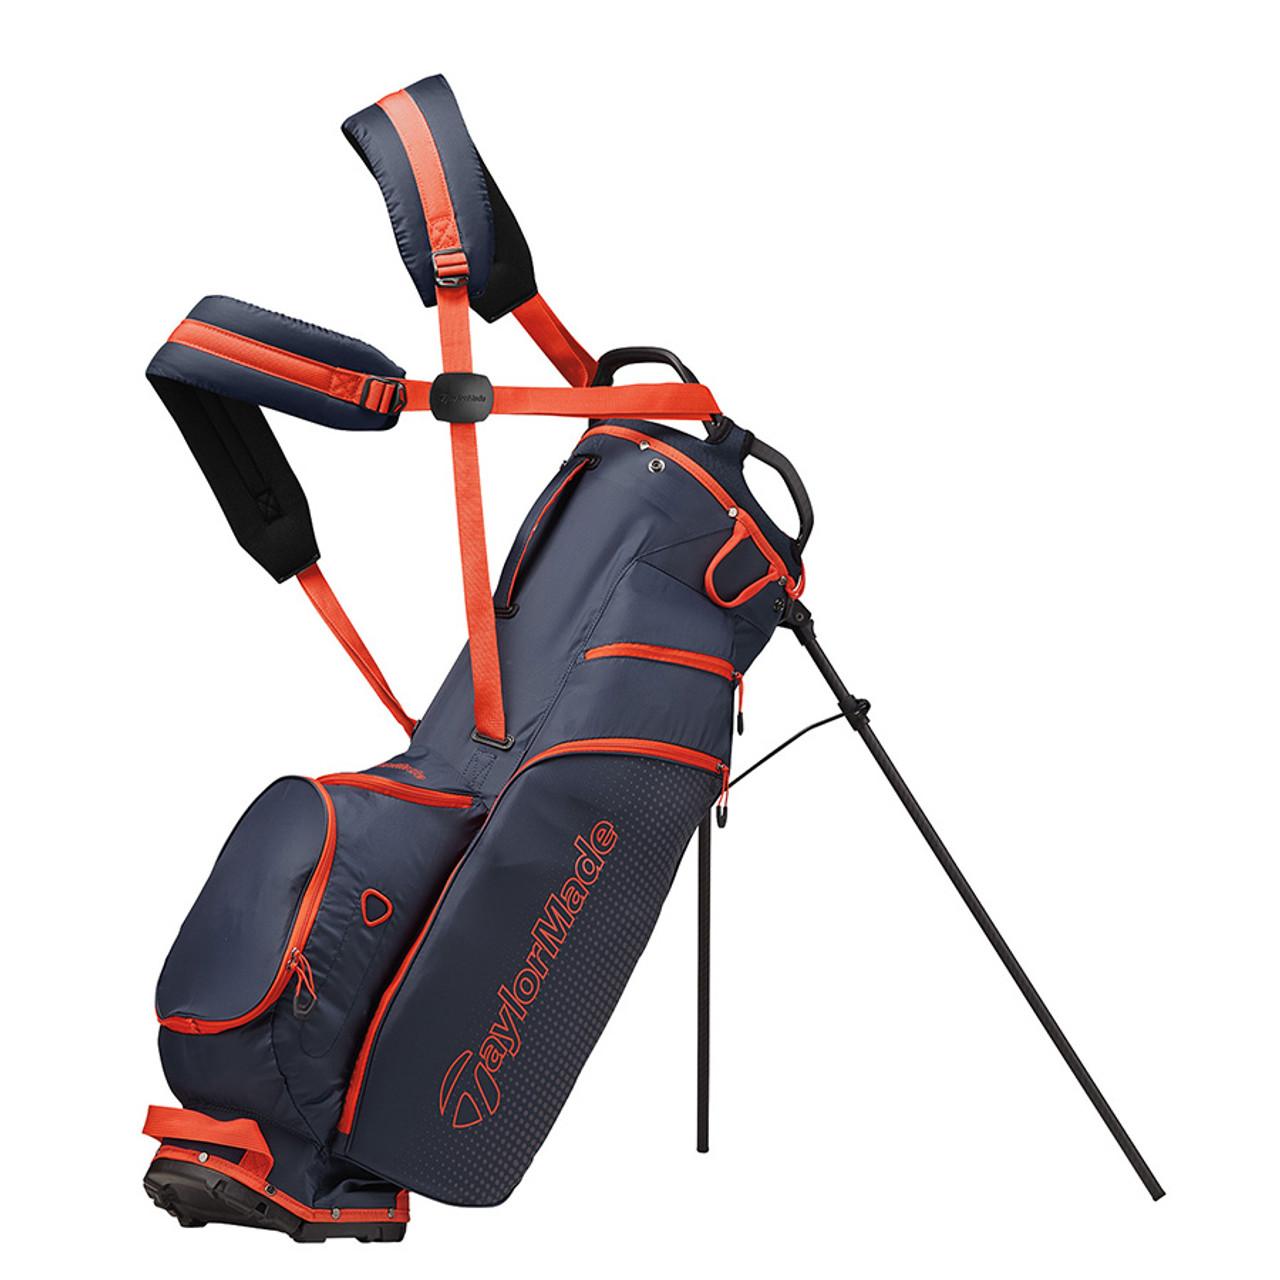 Taylormade Golf Bag >> Taylormade Litetech 3 0 Stand Bag Rockbottomgolf Com